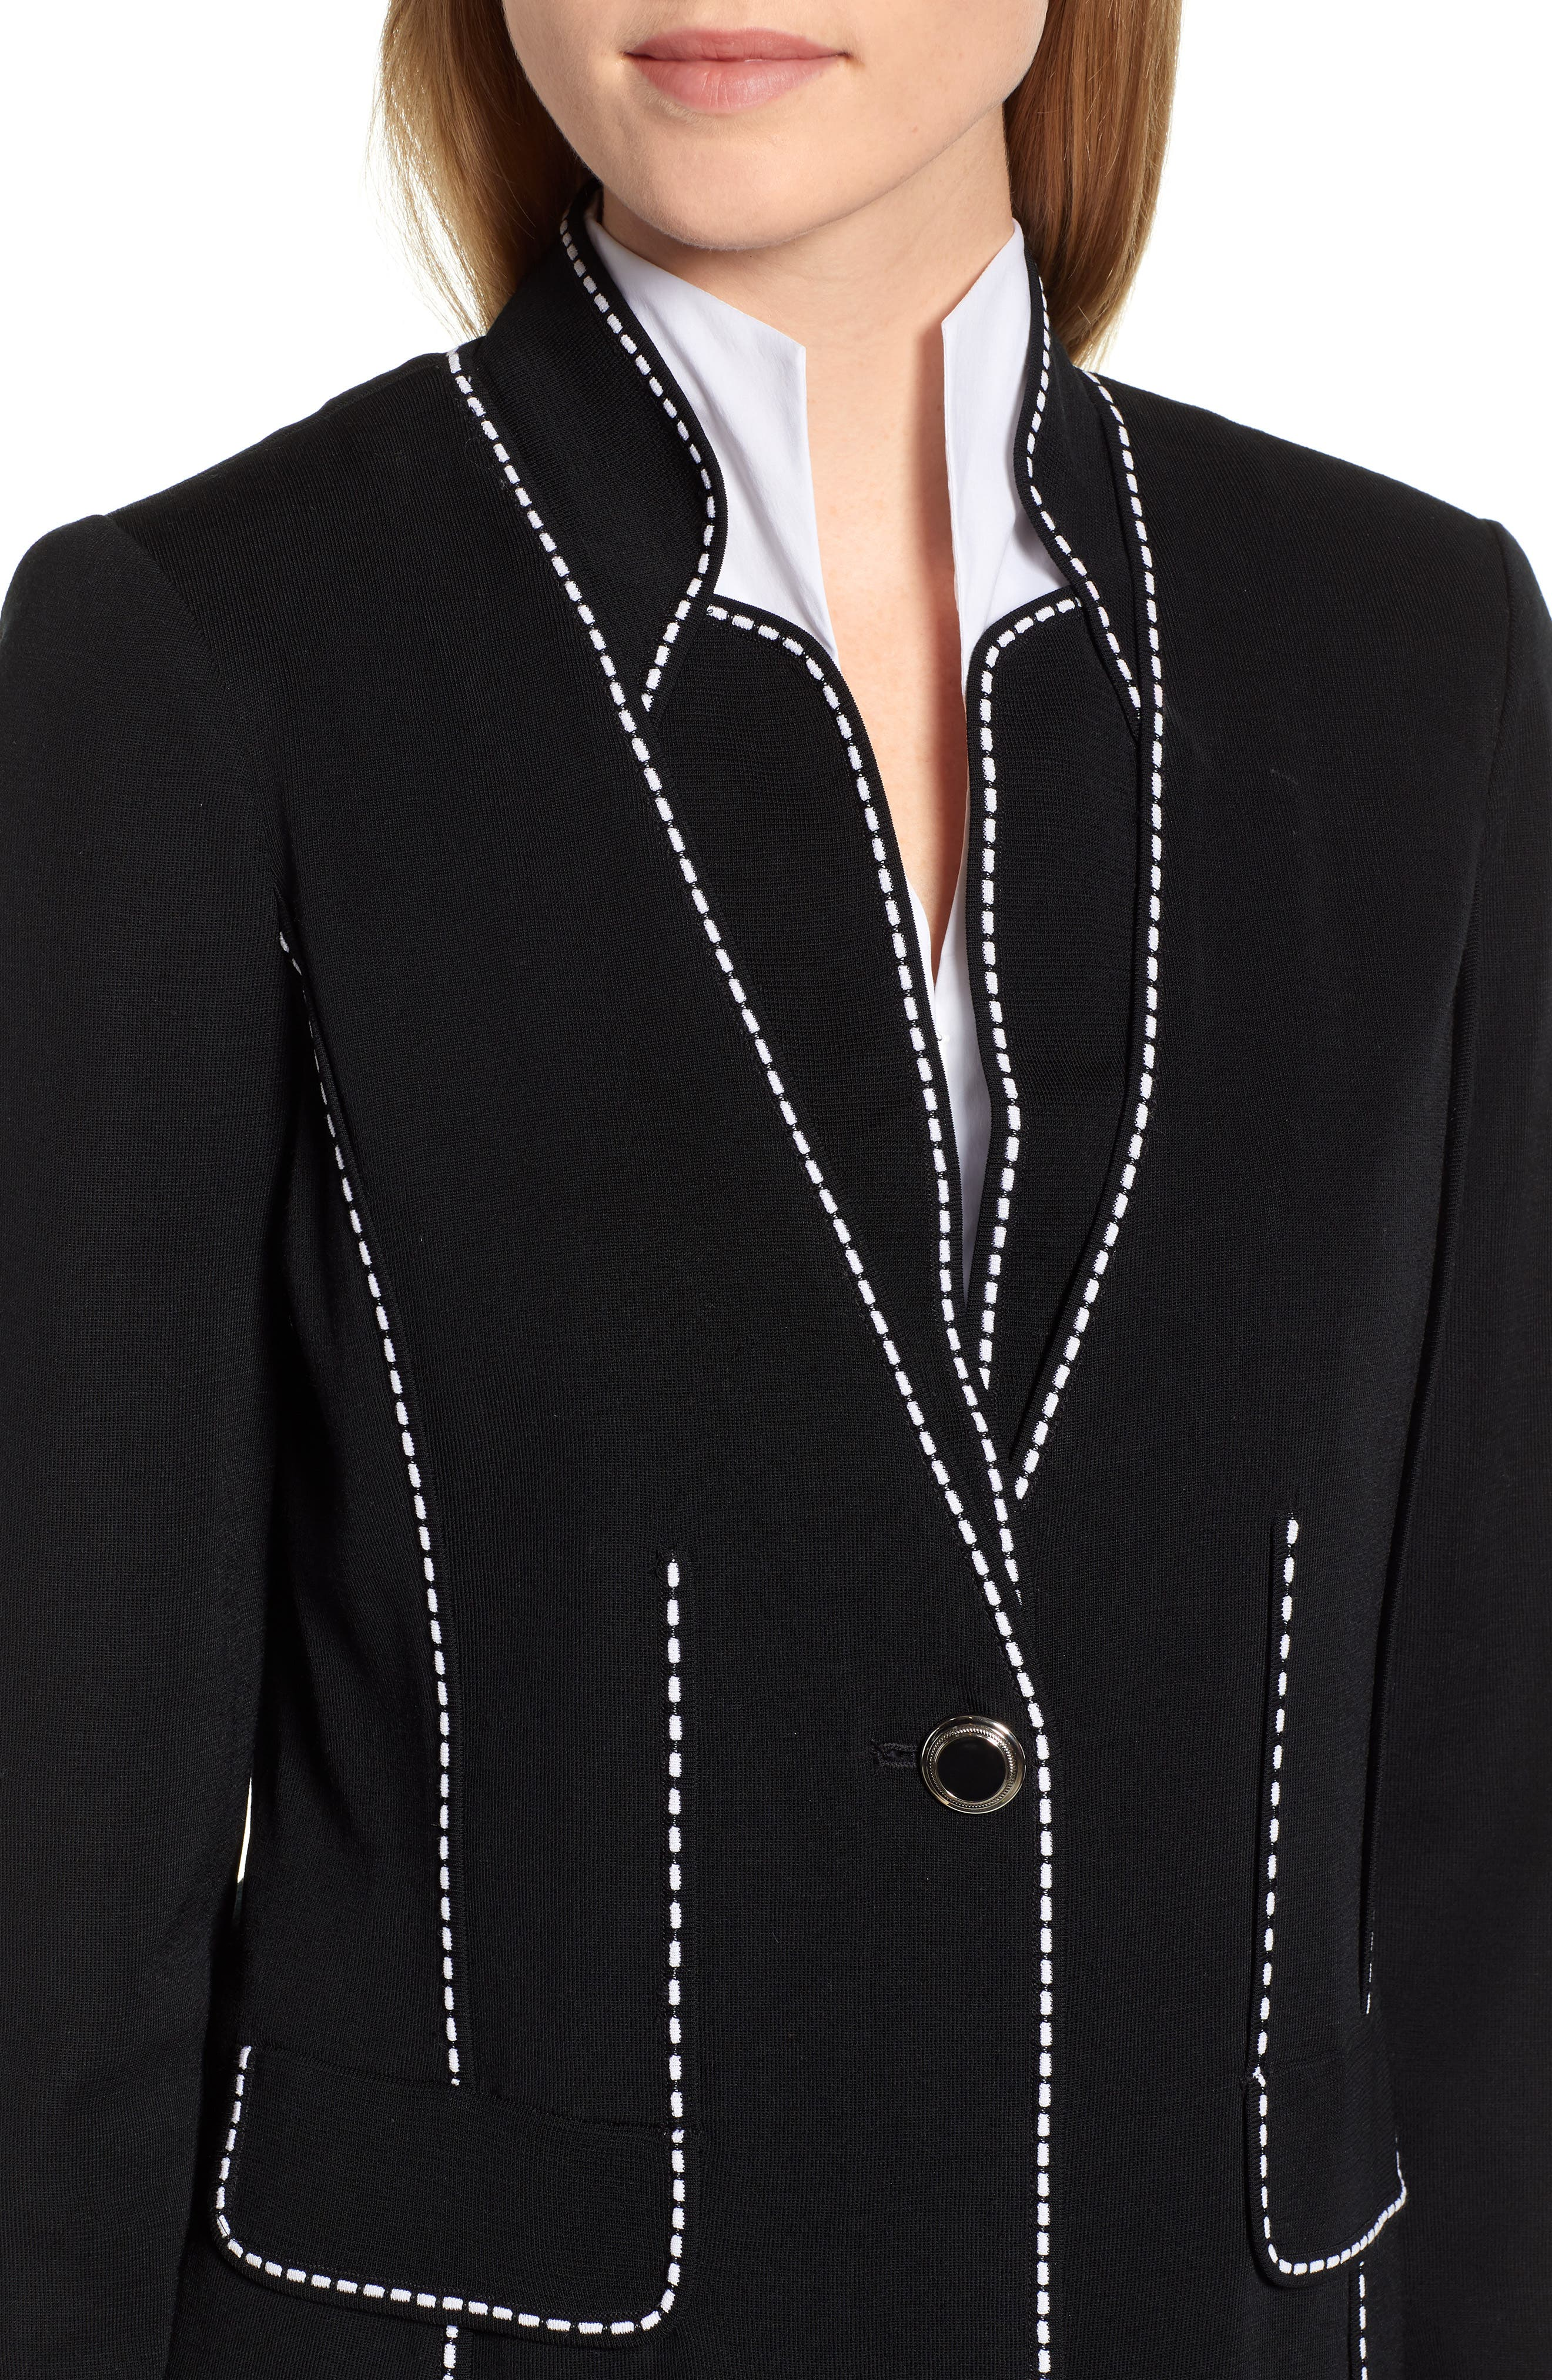 Contrast Jacquard Sweater Jacket,                             Alternate thumbnail 4, color,                             BLACK/ WHITE